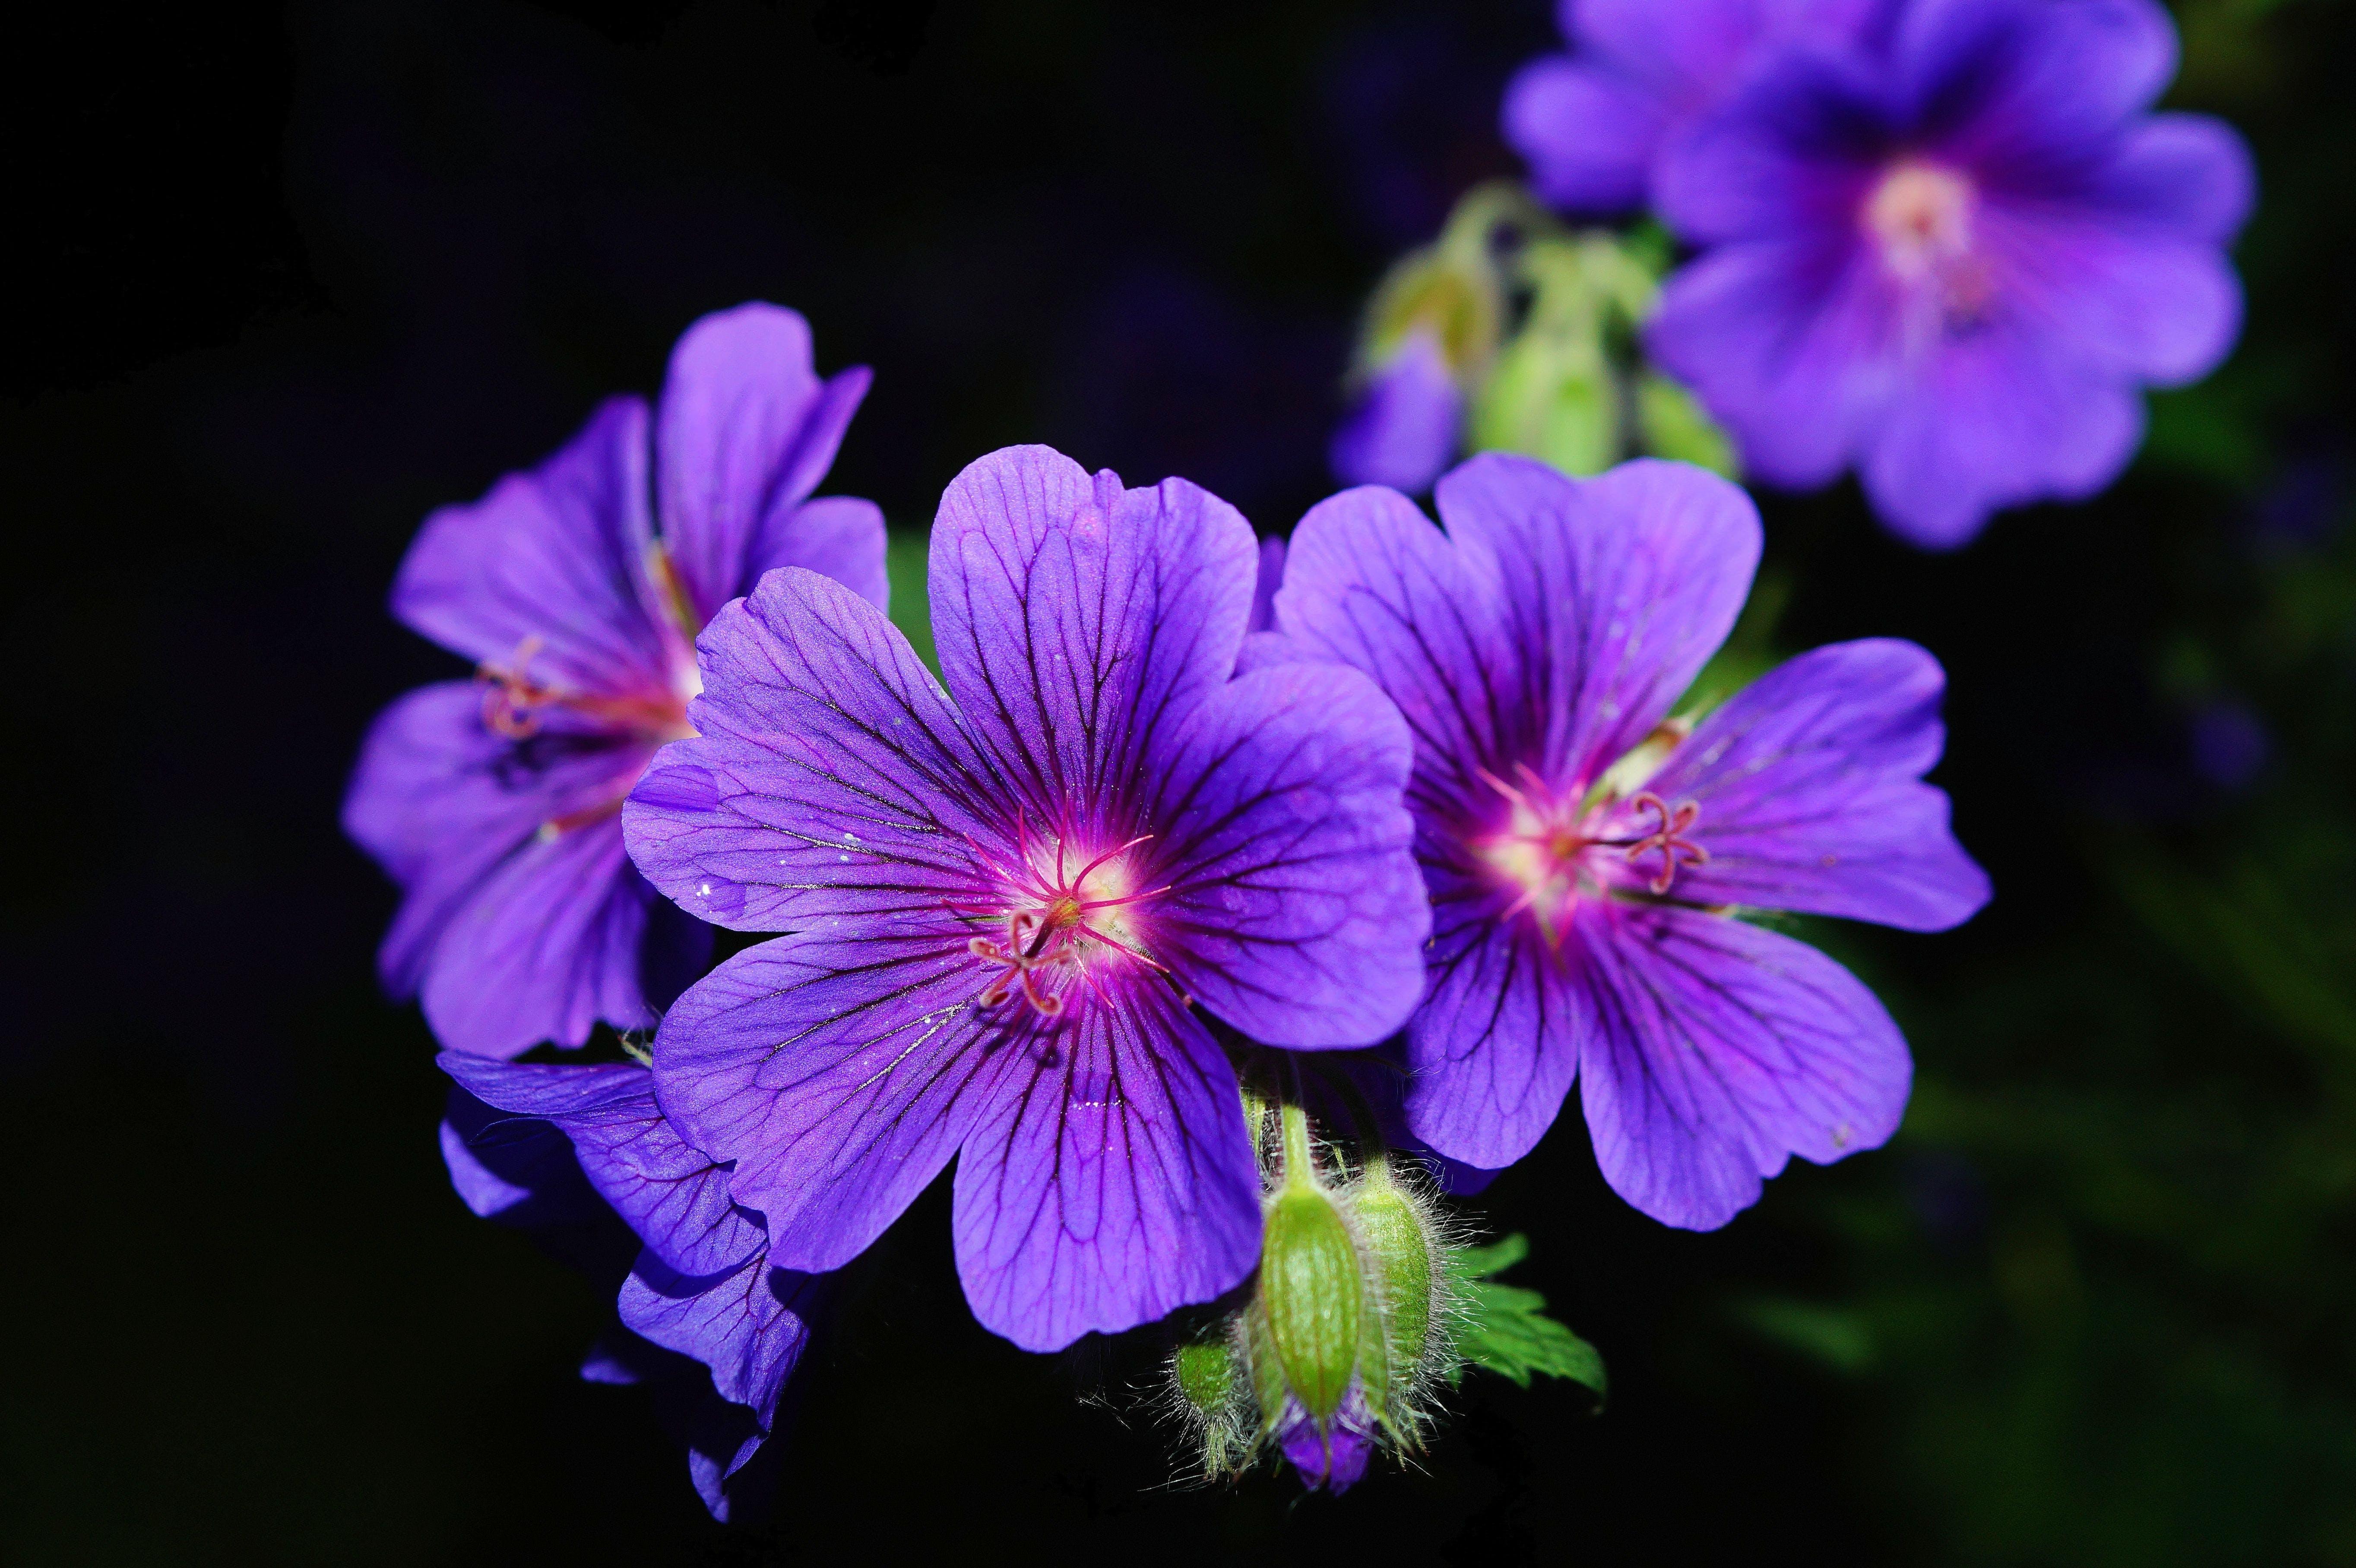 Purple 5 Petaled Flower Close Up Photography